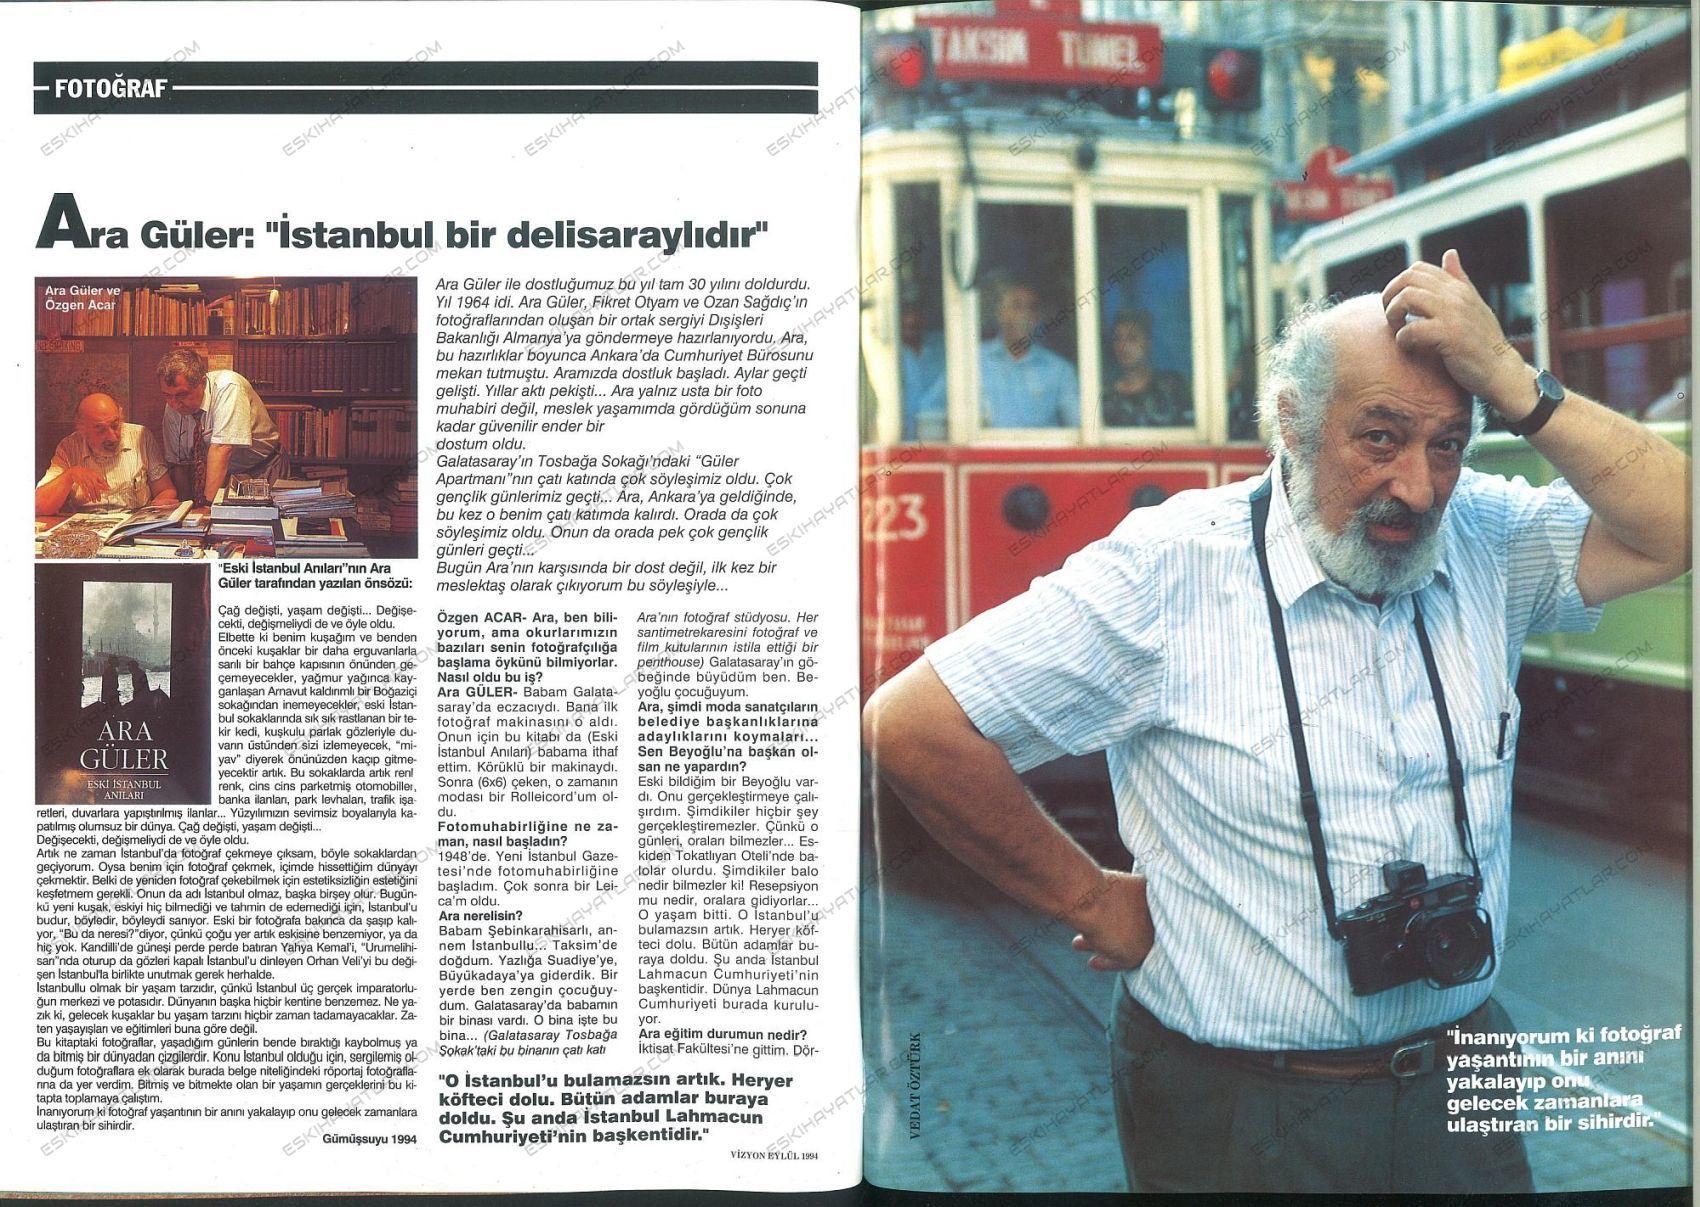 0364-ara-guler-1994-vizyon-dergisi-eski-istanbul-anilari-roportaj (1)